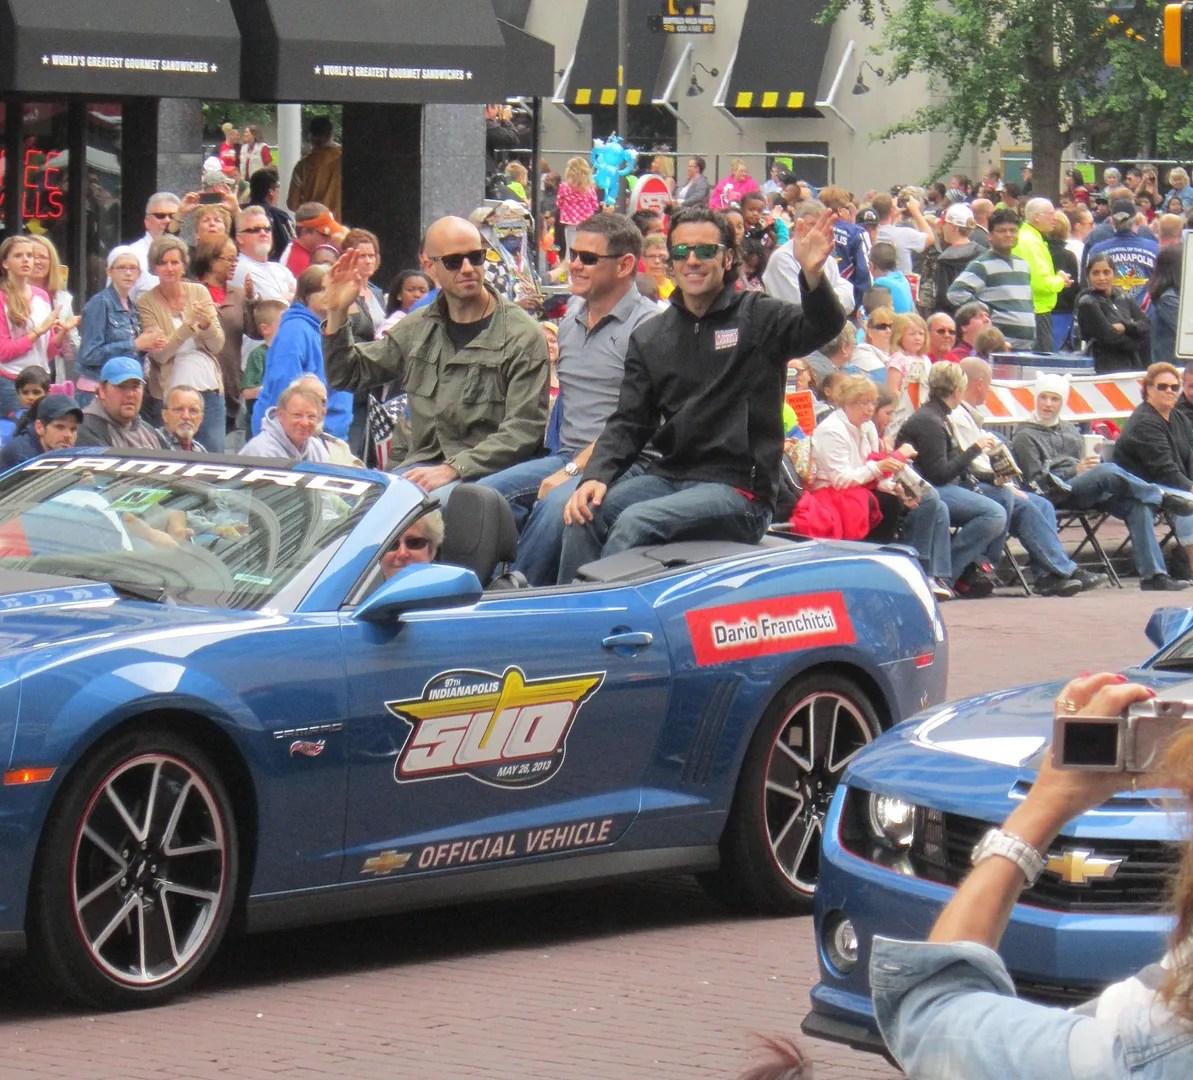 Dario Franchitti, Indianapolis, 500, 500 Festival Parade, Indianapolis, 2013